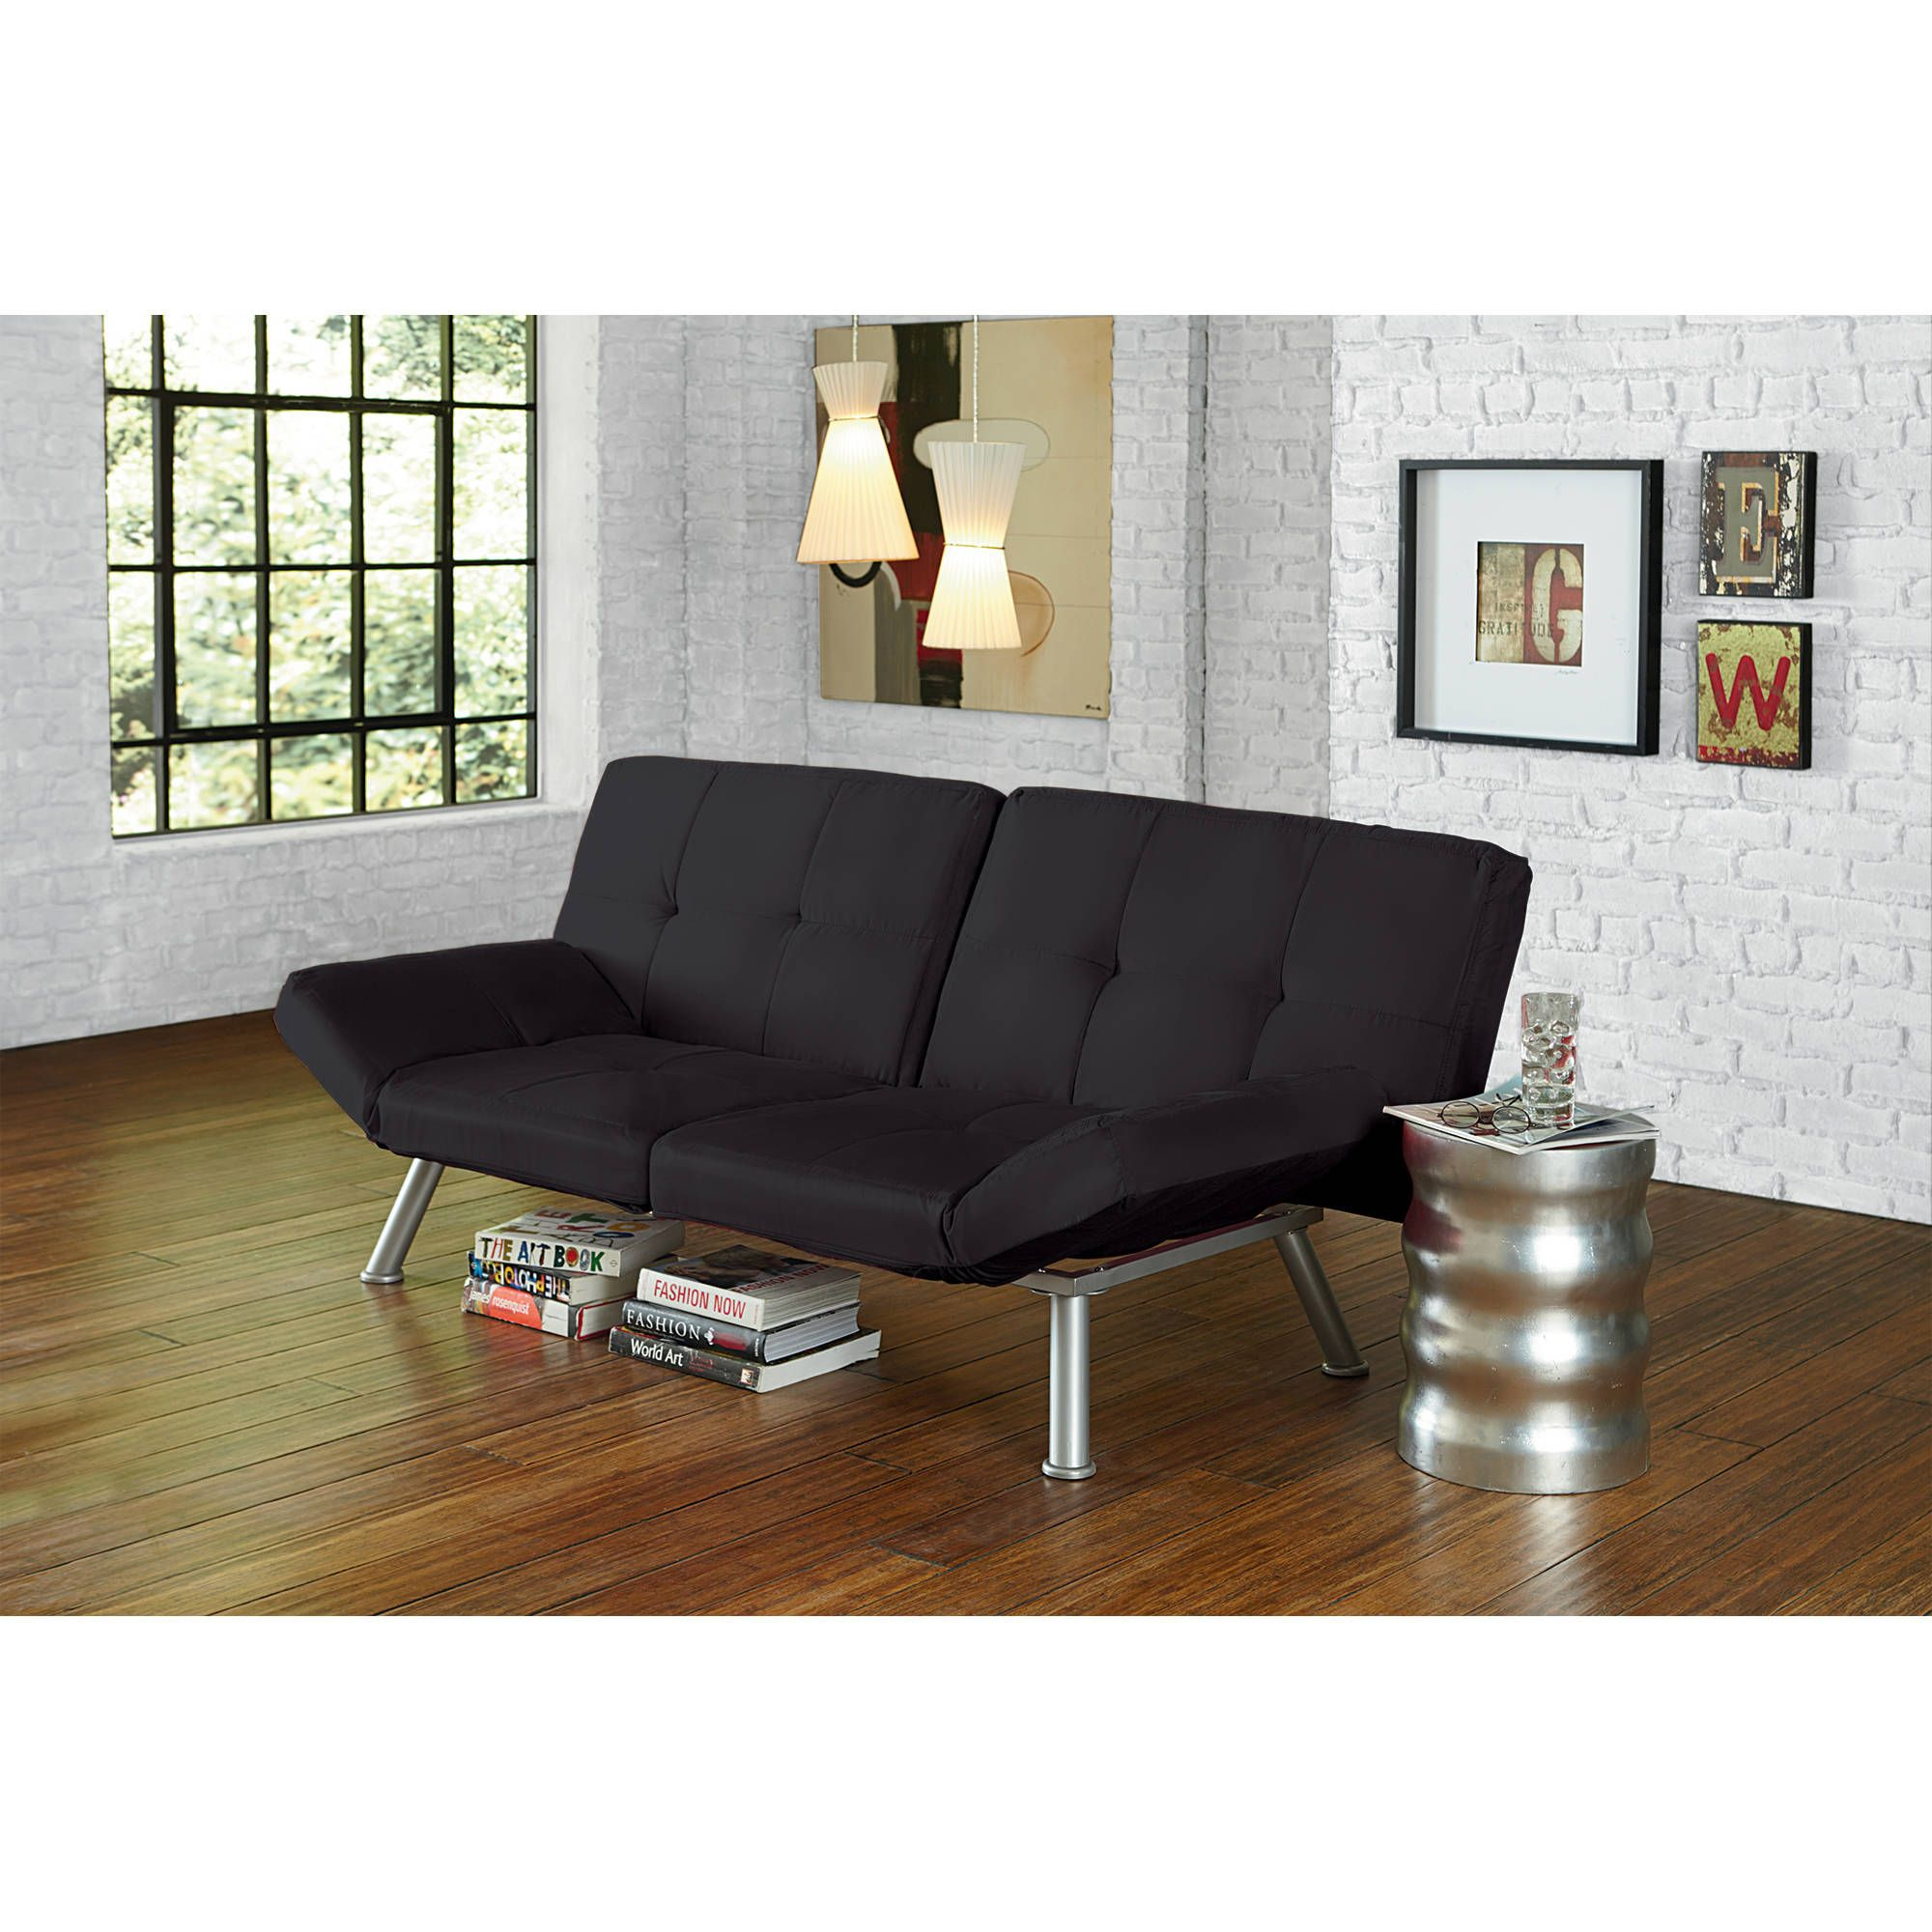 Miraculous Home Futons Futon Sofa Couch Dining Table Futon Sofa Bed Creativecarmelina Interior Chair Design Creativecarmelinacom